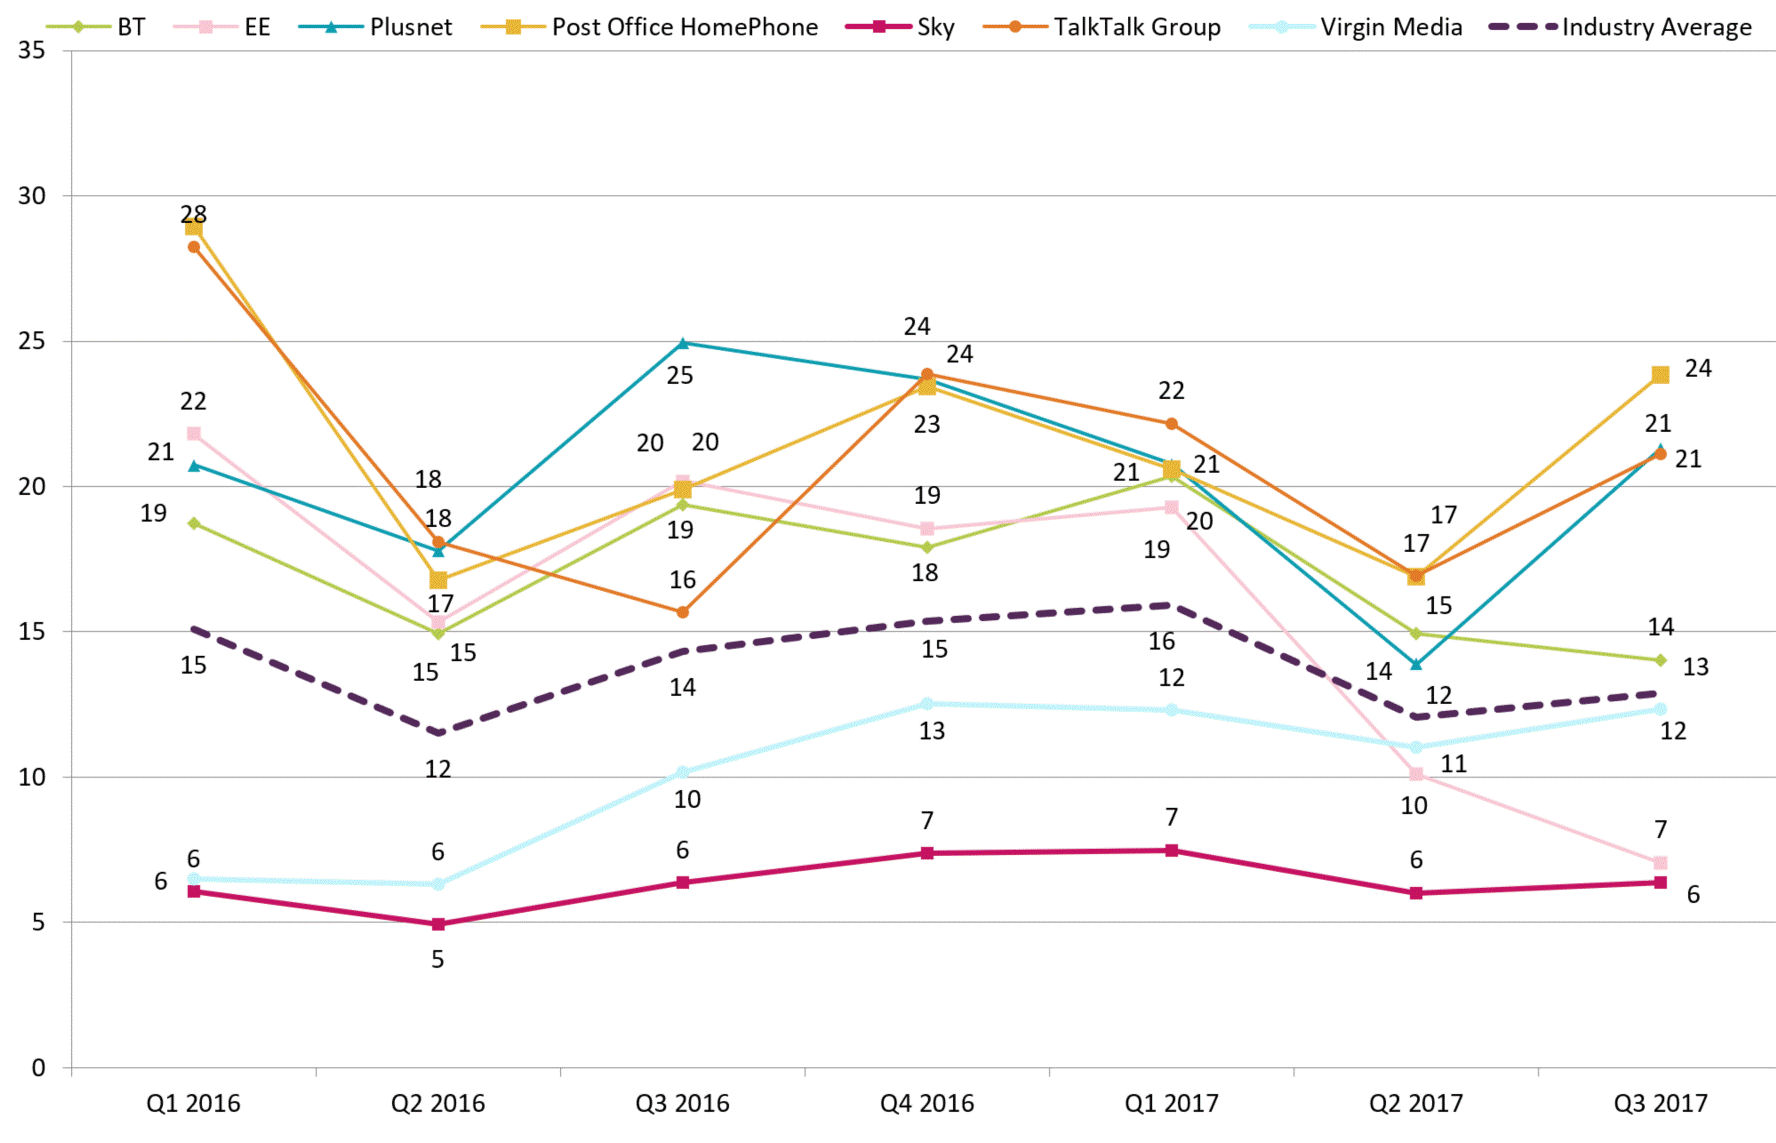 Ofcom Q3 2017 landline complaints